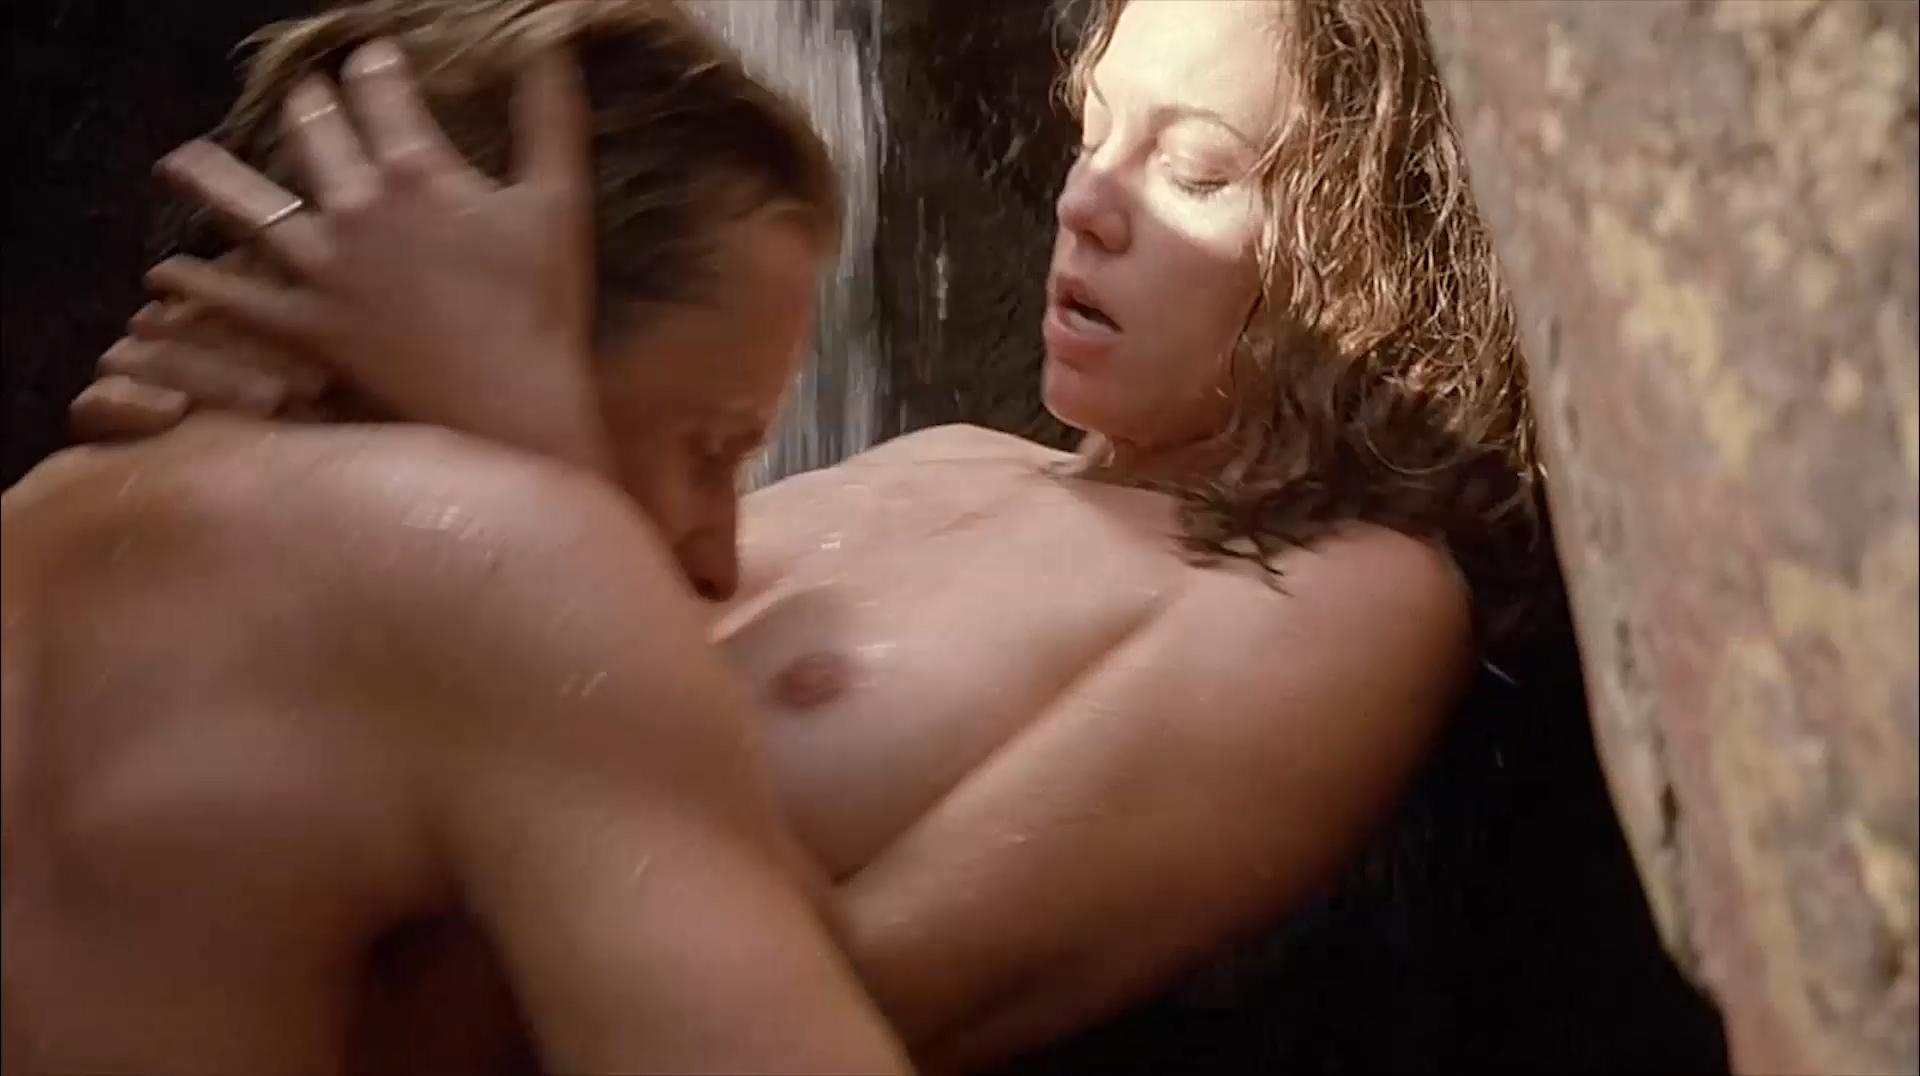 image Diane lane nude sex scene in vital signs scandalplanetcom